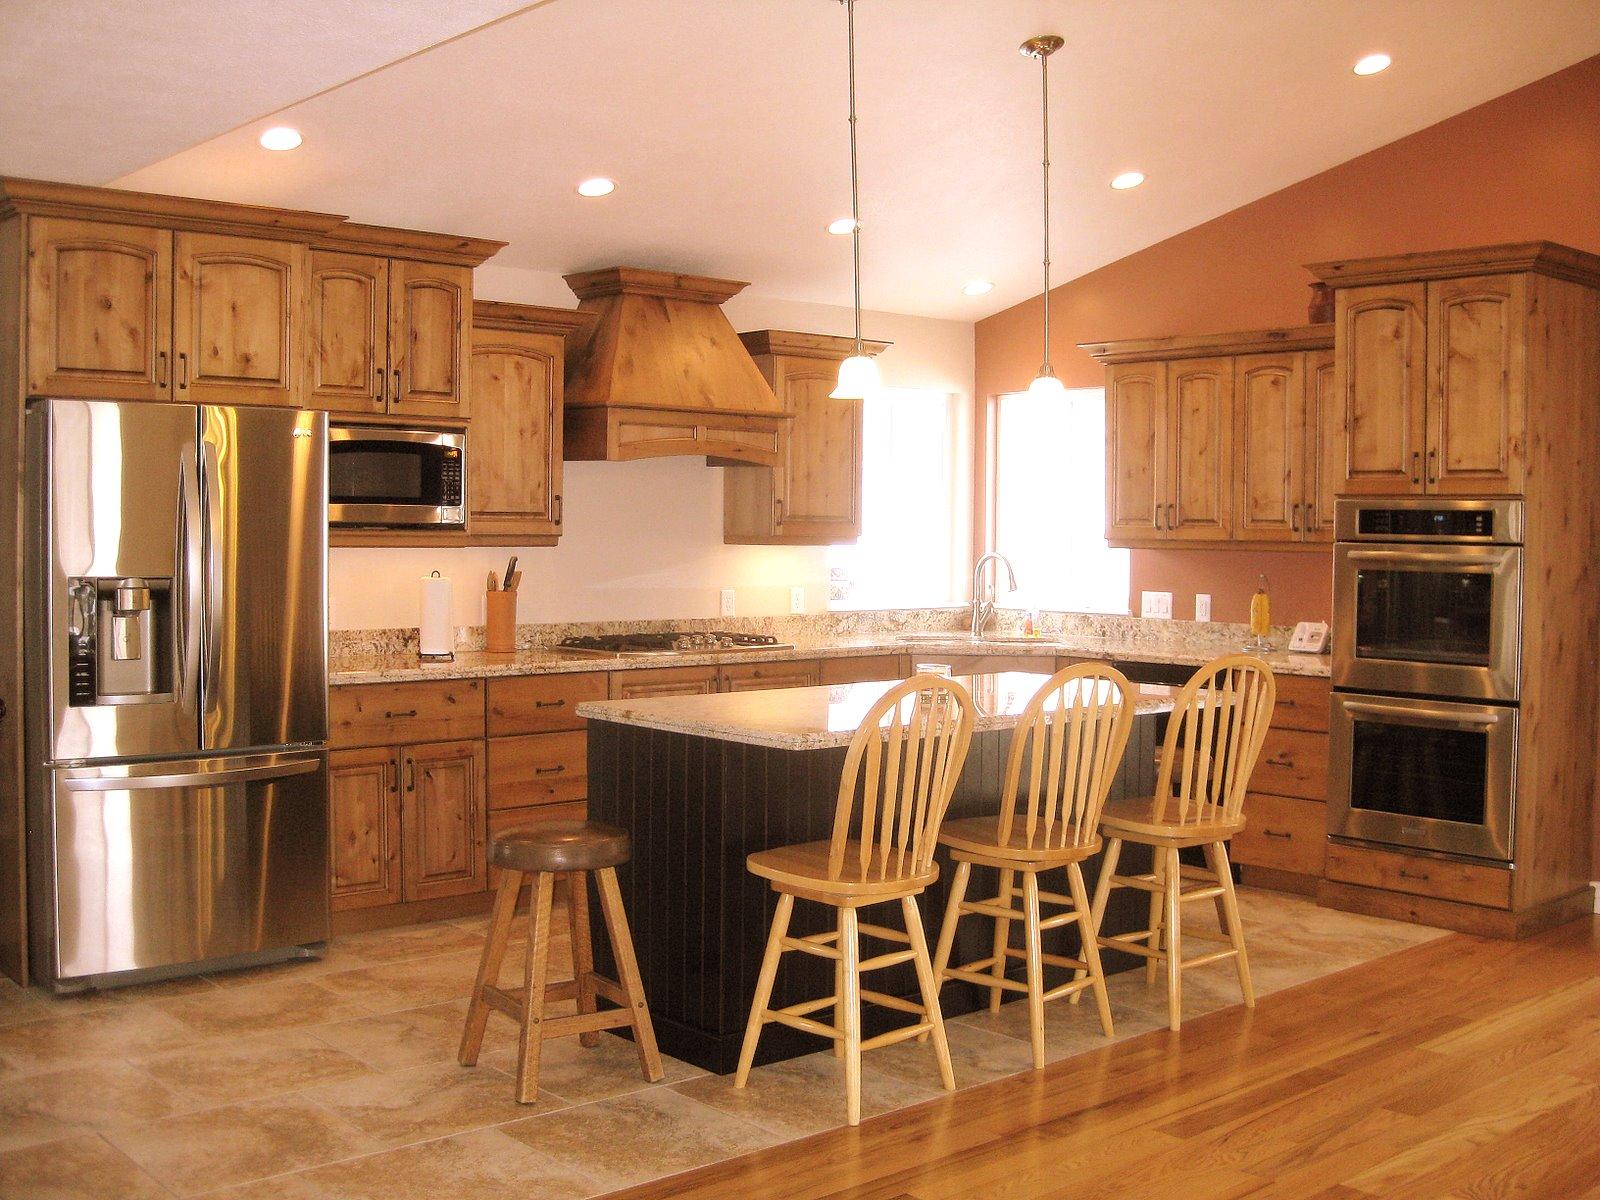 lec cabinets alder kitchen with bead board island. Black Bedroom Furniture Sets. Home Design Ideas